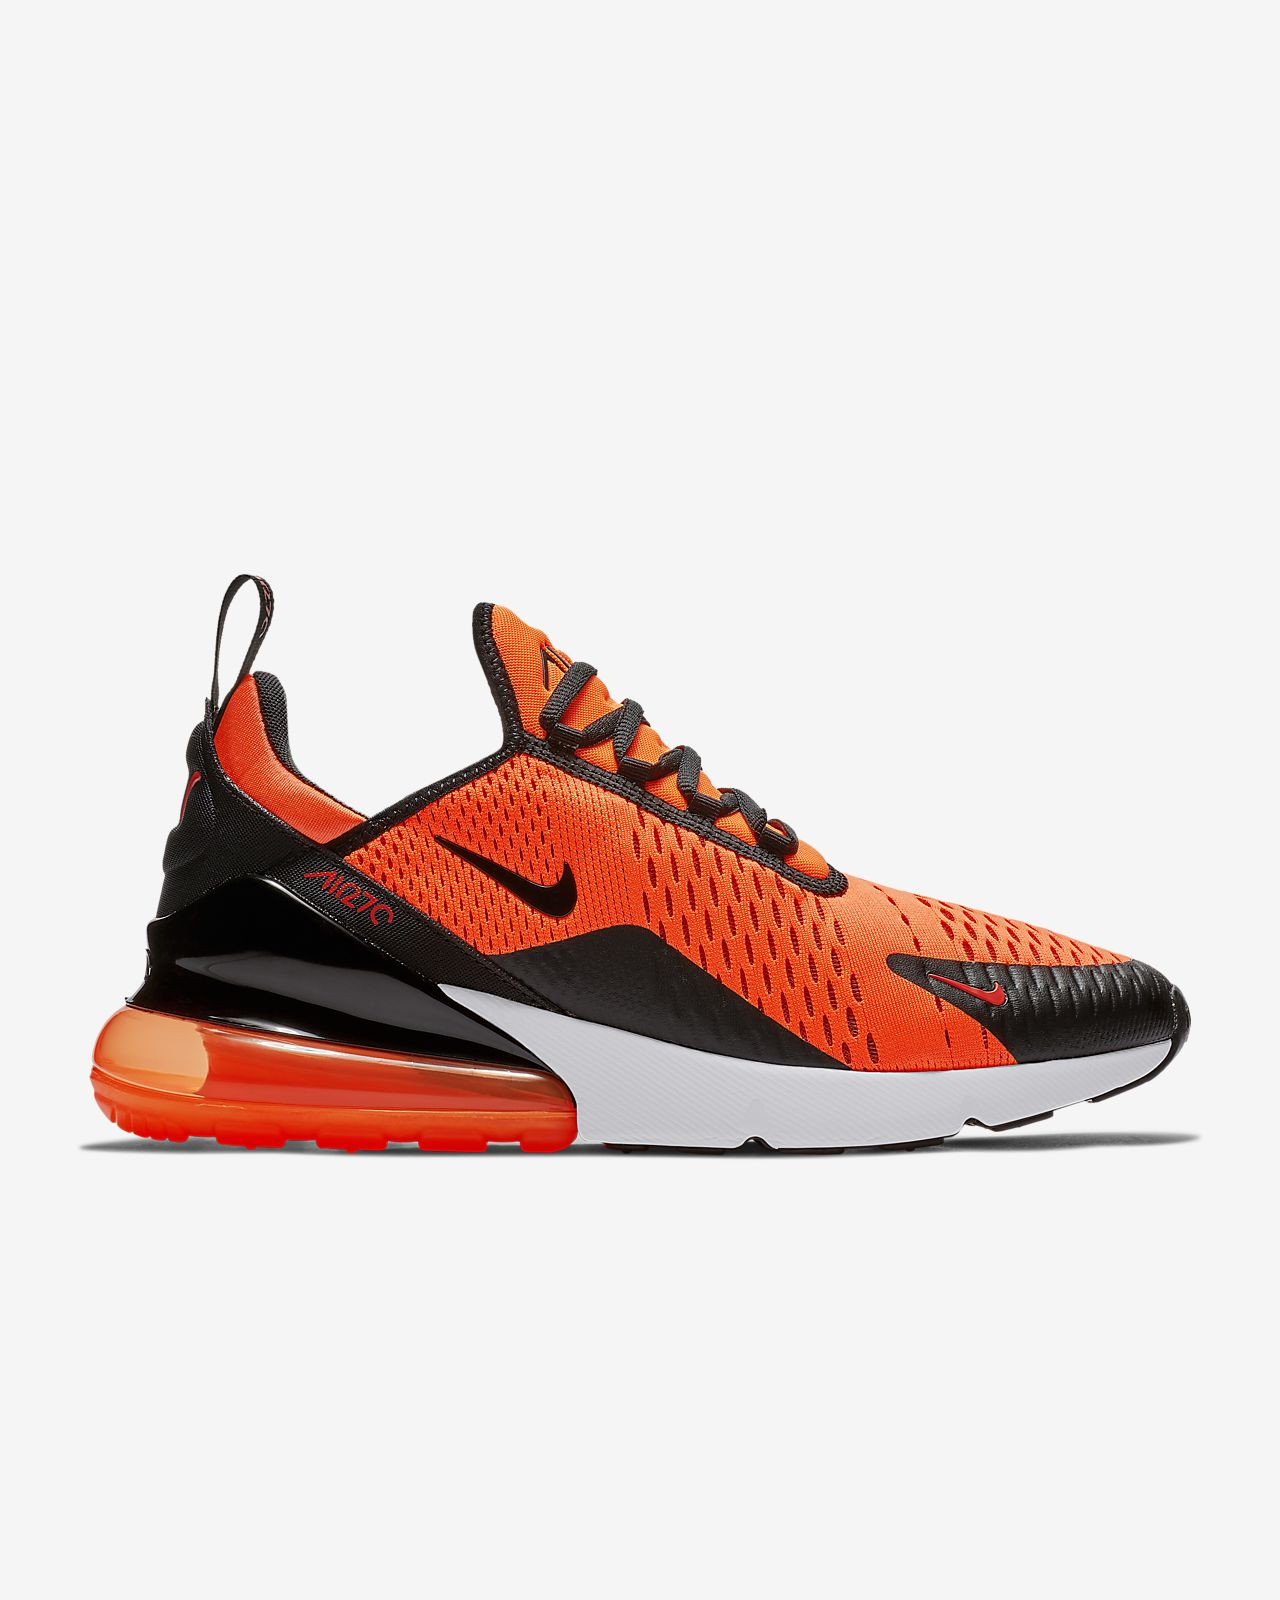 lowest price 8afef a5eda ... Nike Air Max 270 Men s Shoe